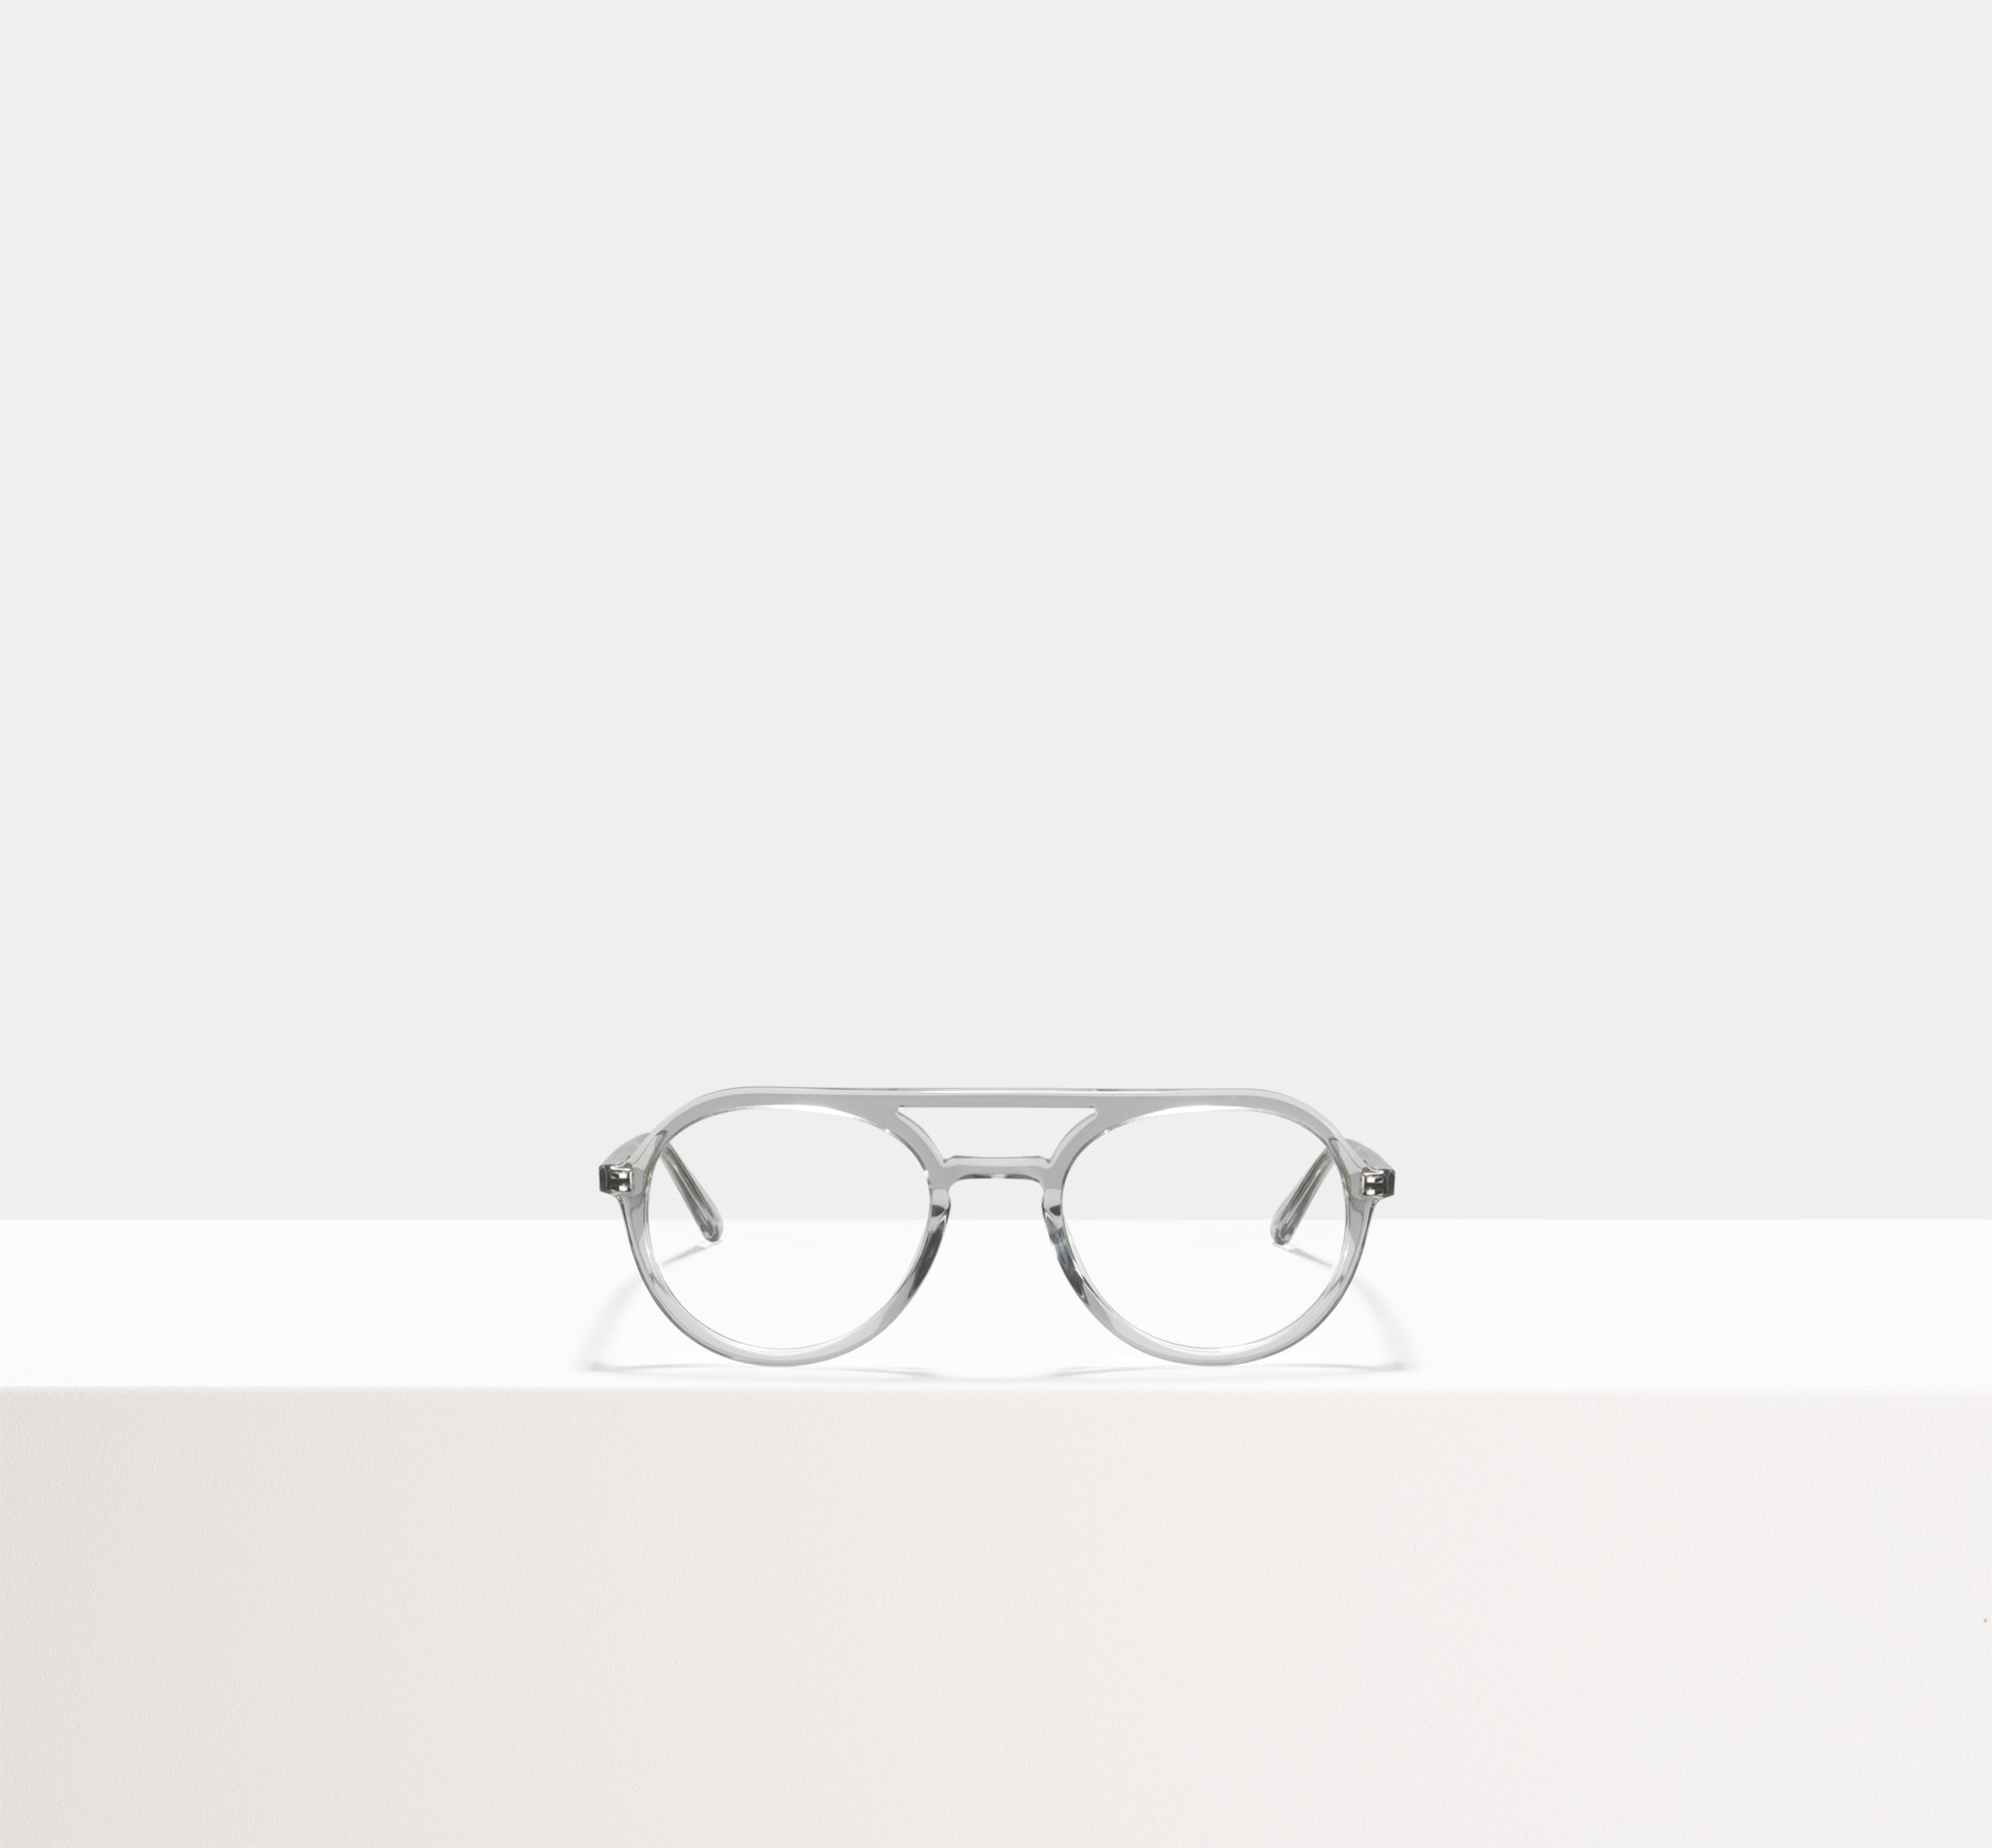 Rectangular sunglasses in Silver Ace & Tate PX78s2xi3